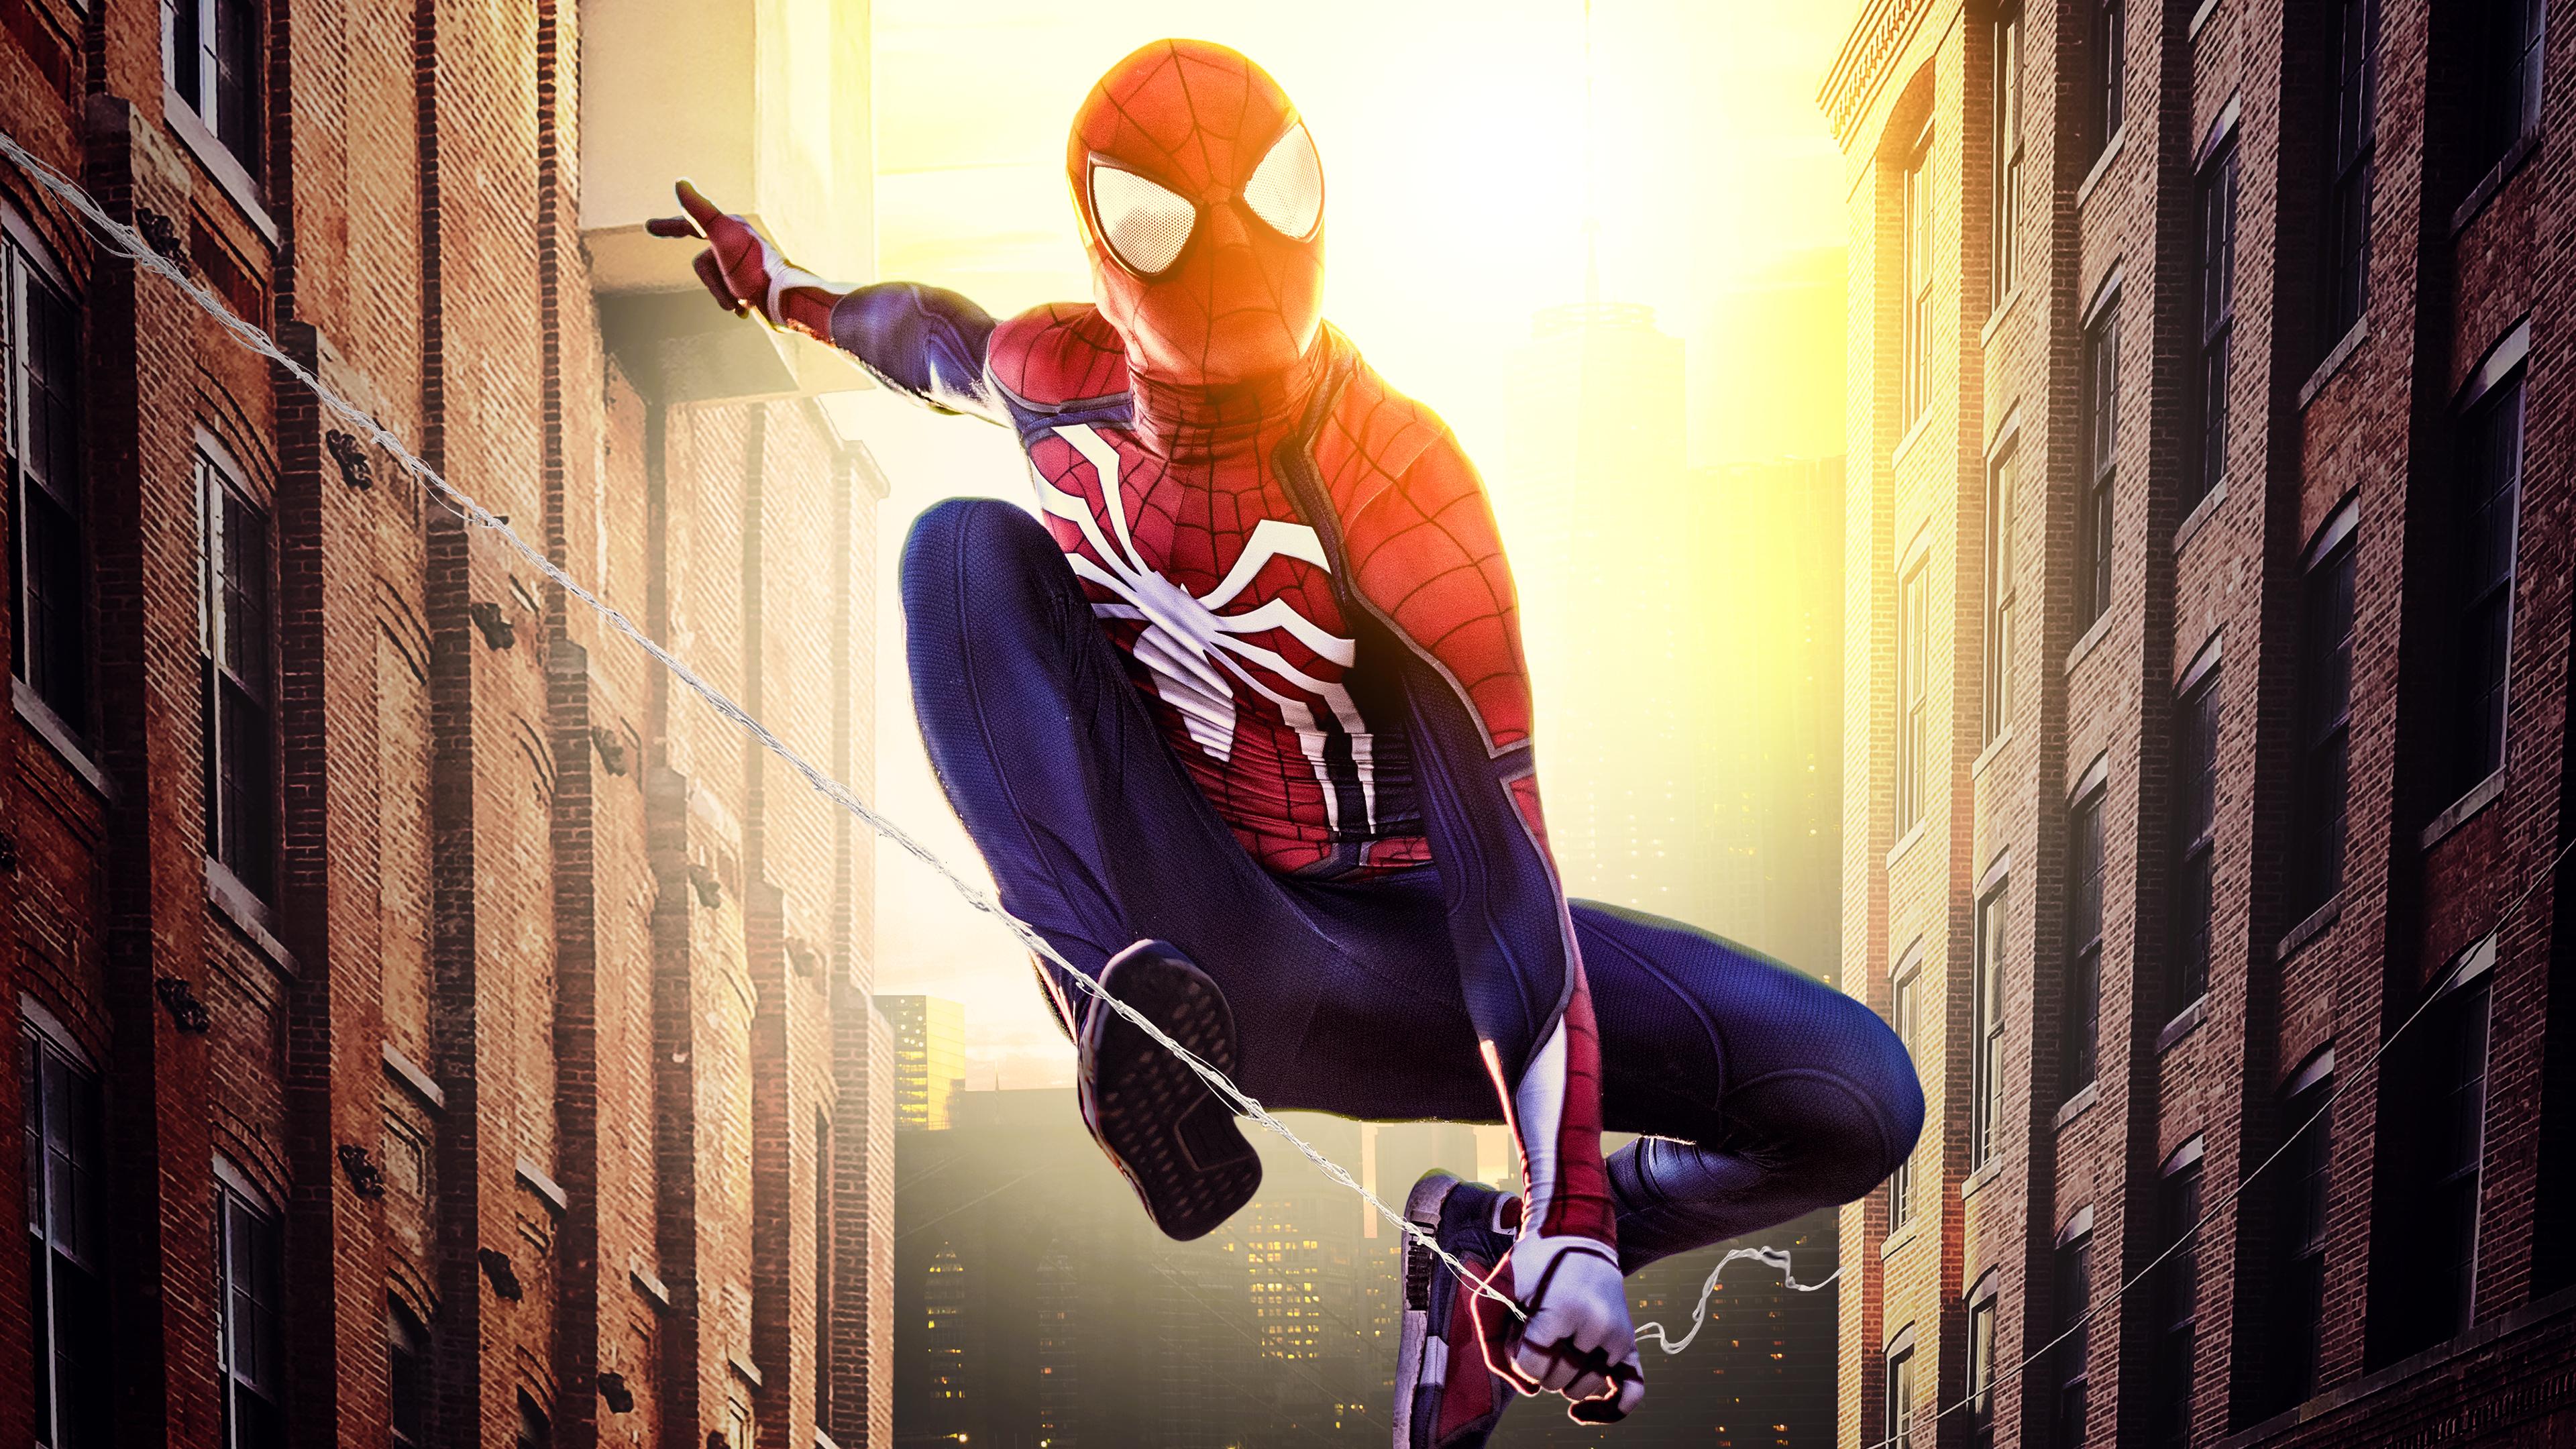 4k spiderman new york 1554244978 - 4k Spiderman New York - superheroes wallpapers, spiderman wallpapers, hd-wallpapers, digital art wallpapers, behance wallpapers, artwork wallpapers, artist wallpapers, 4k-wallpapers